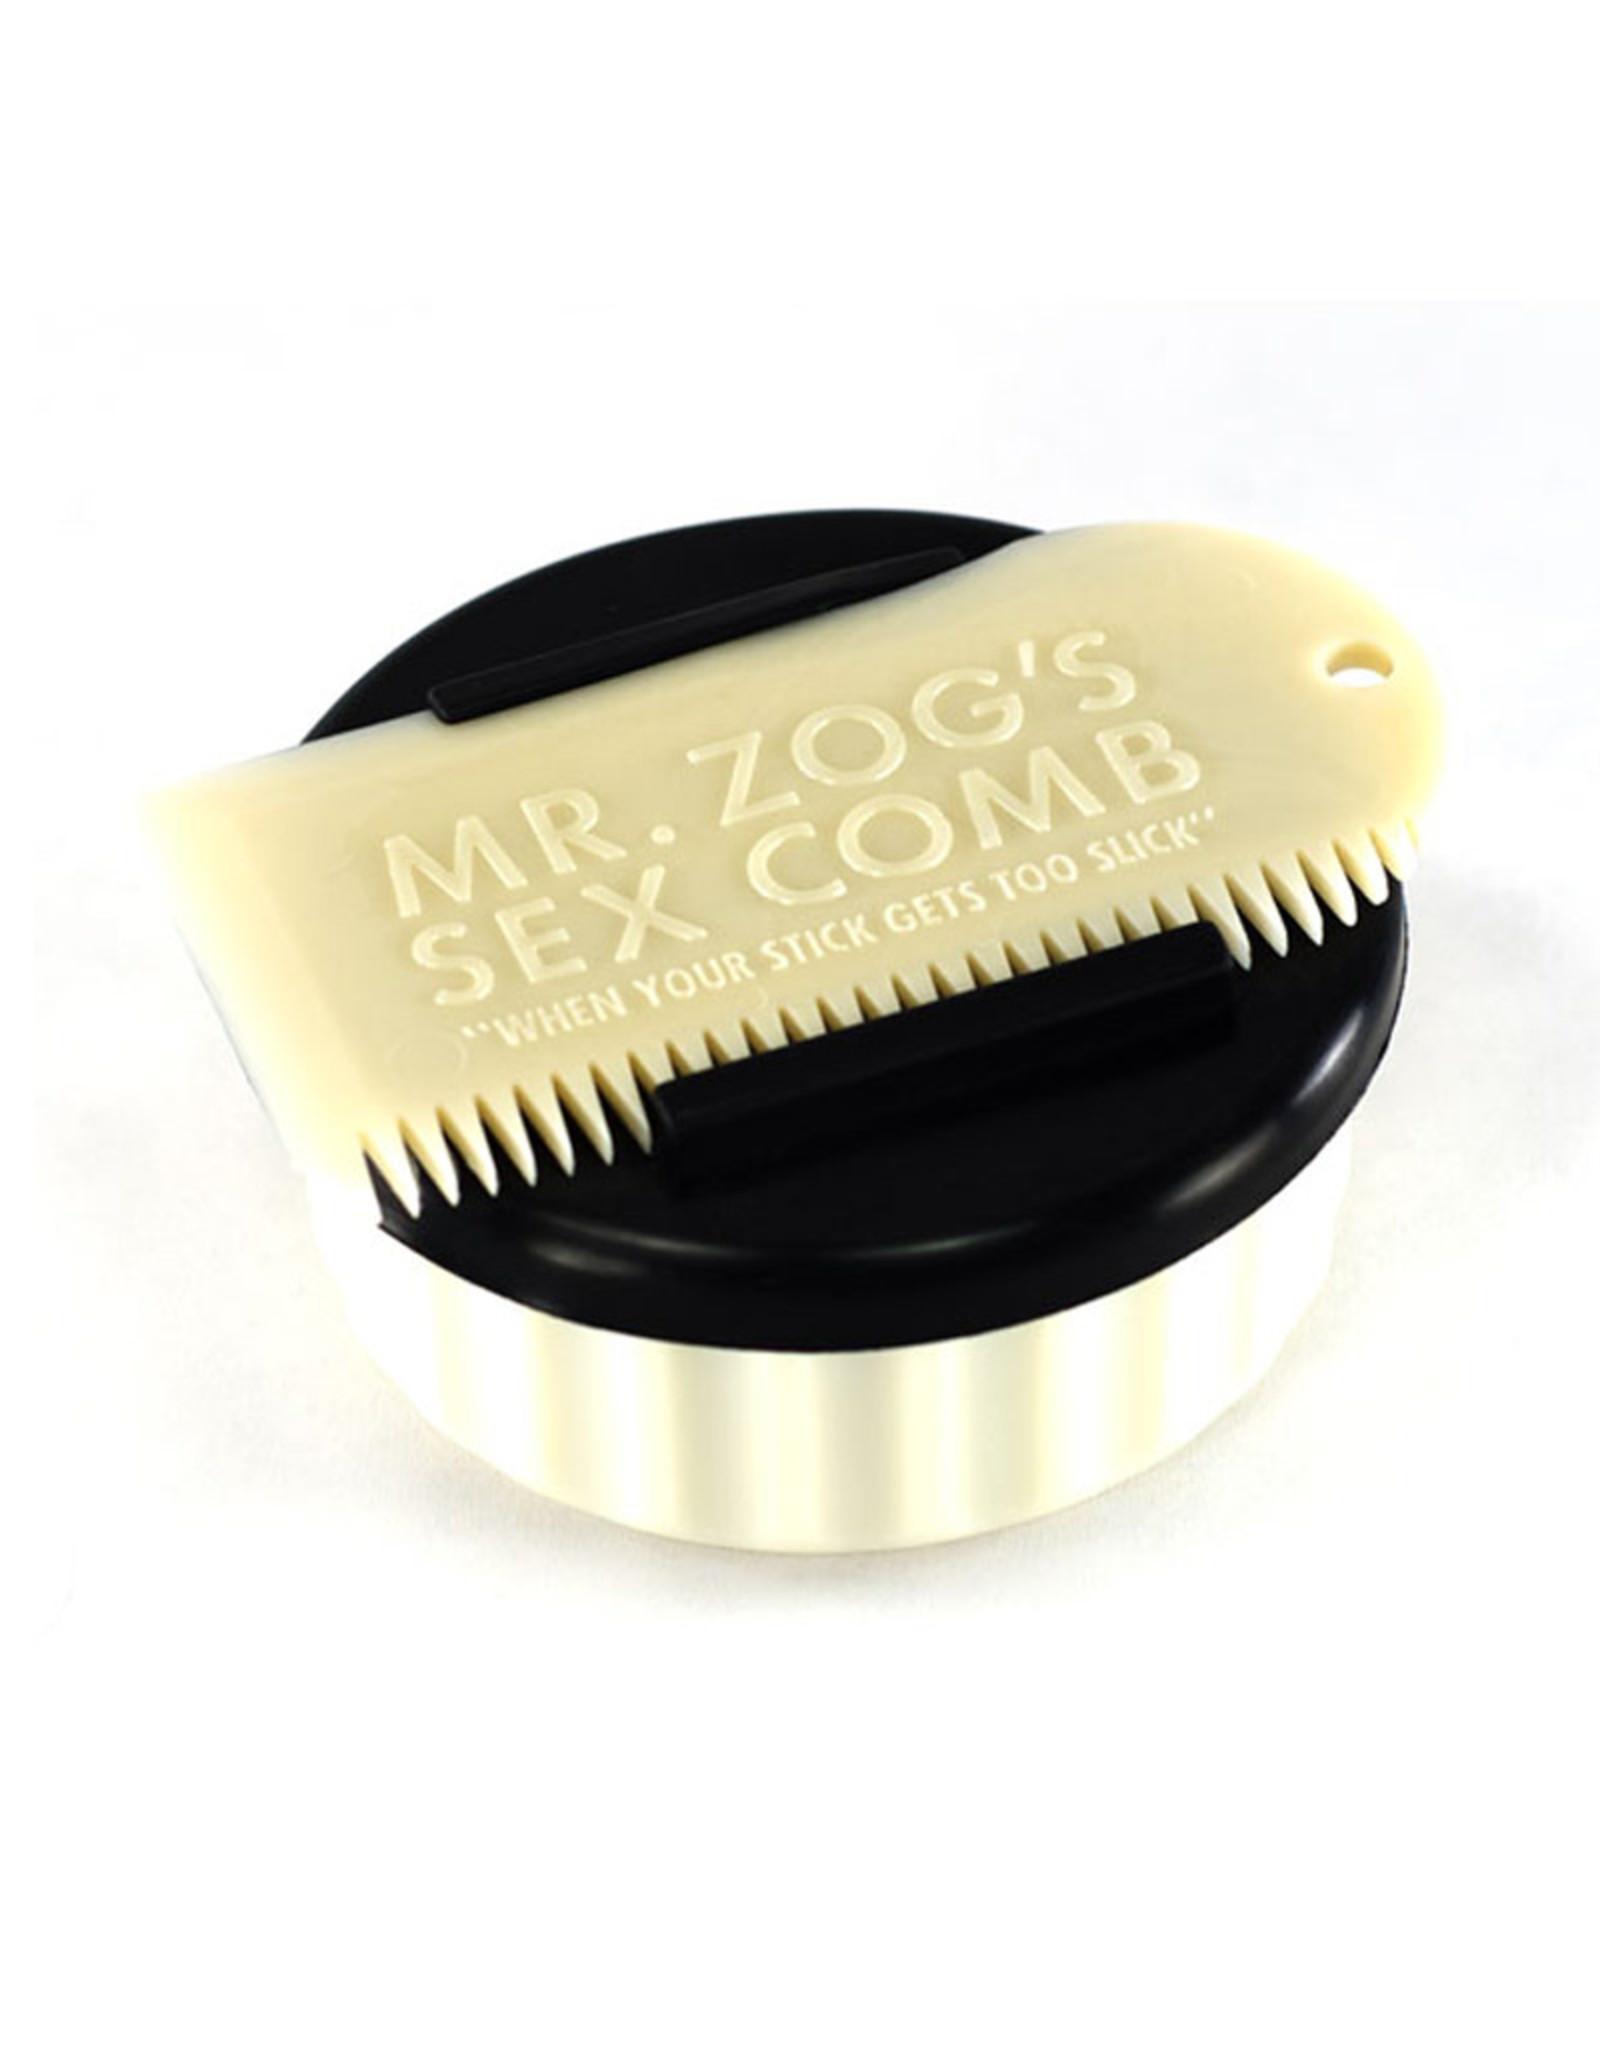 Sex Wax Sex Wax Wax Container & Comb Bone